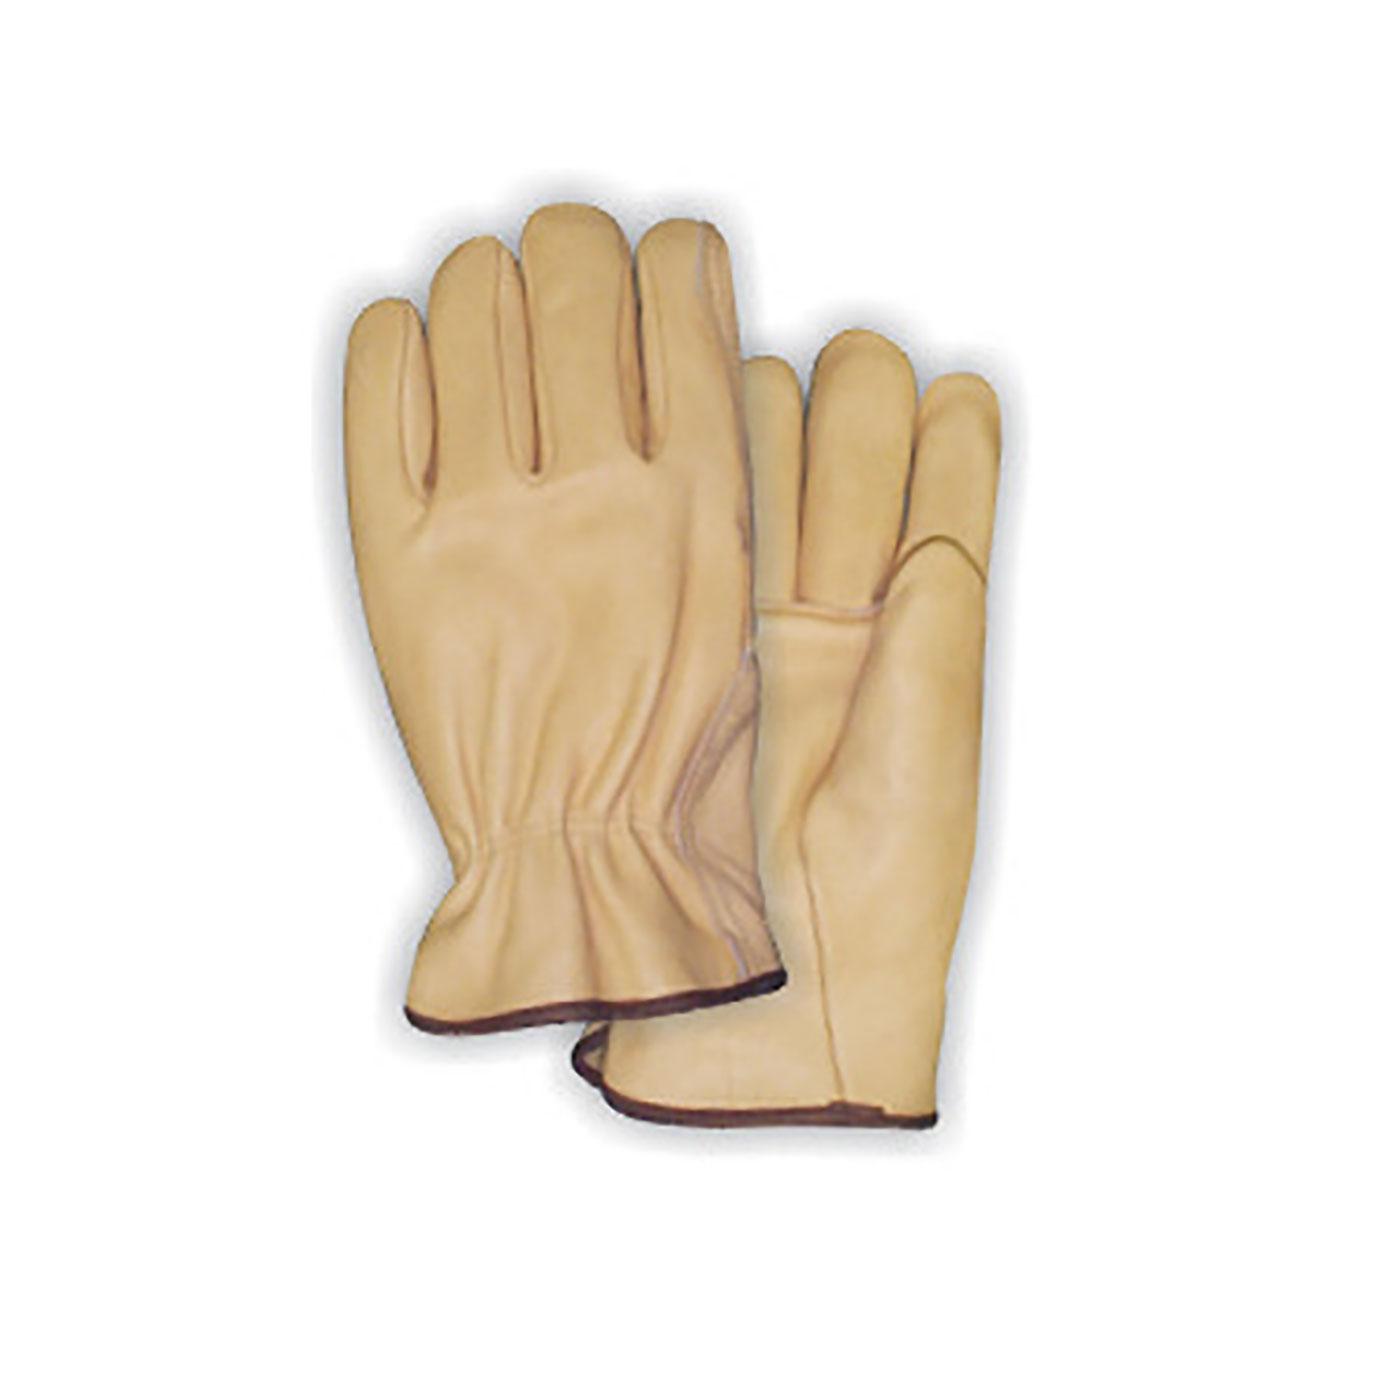 Workhorse Cowgrain Driver's Glove